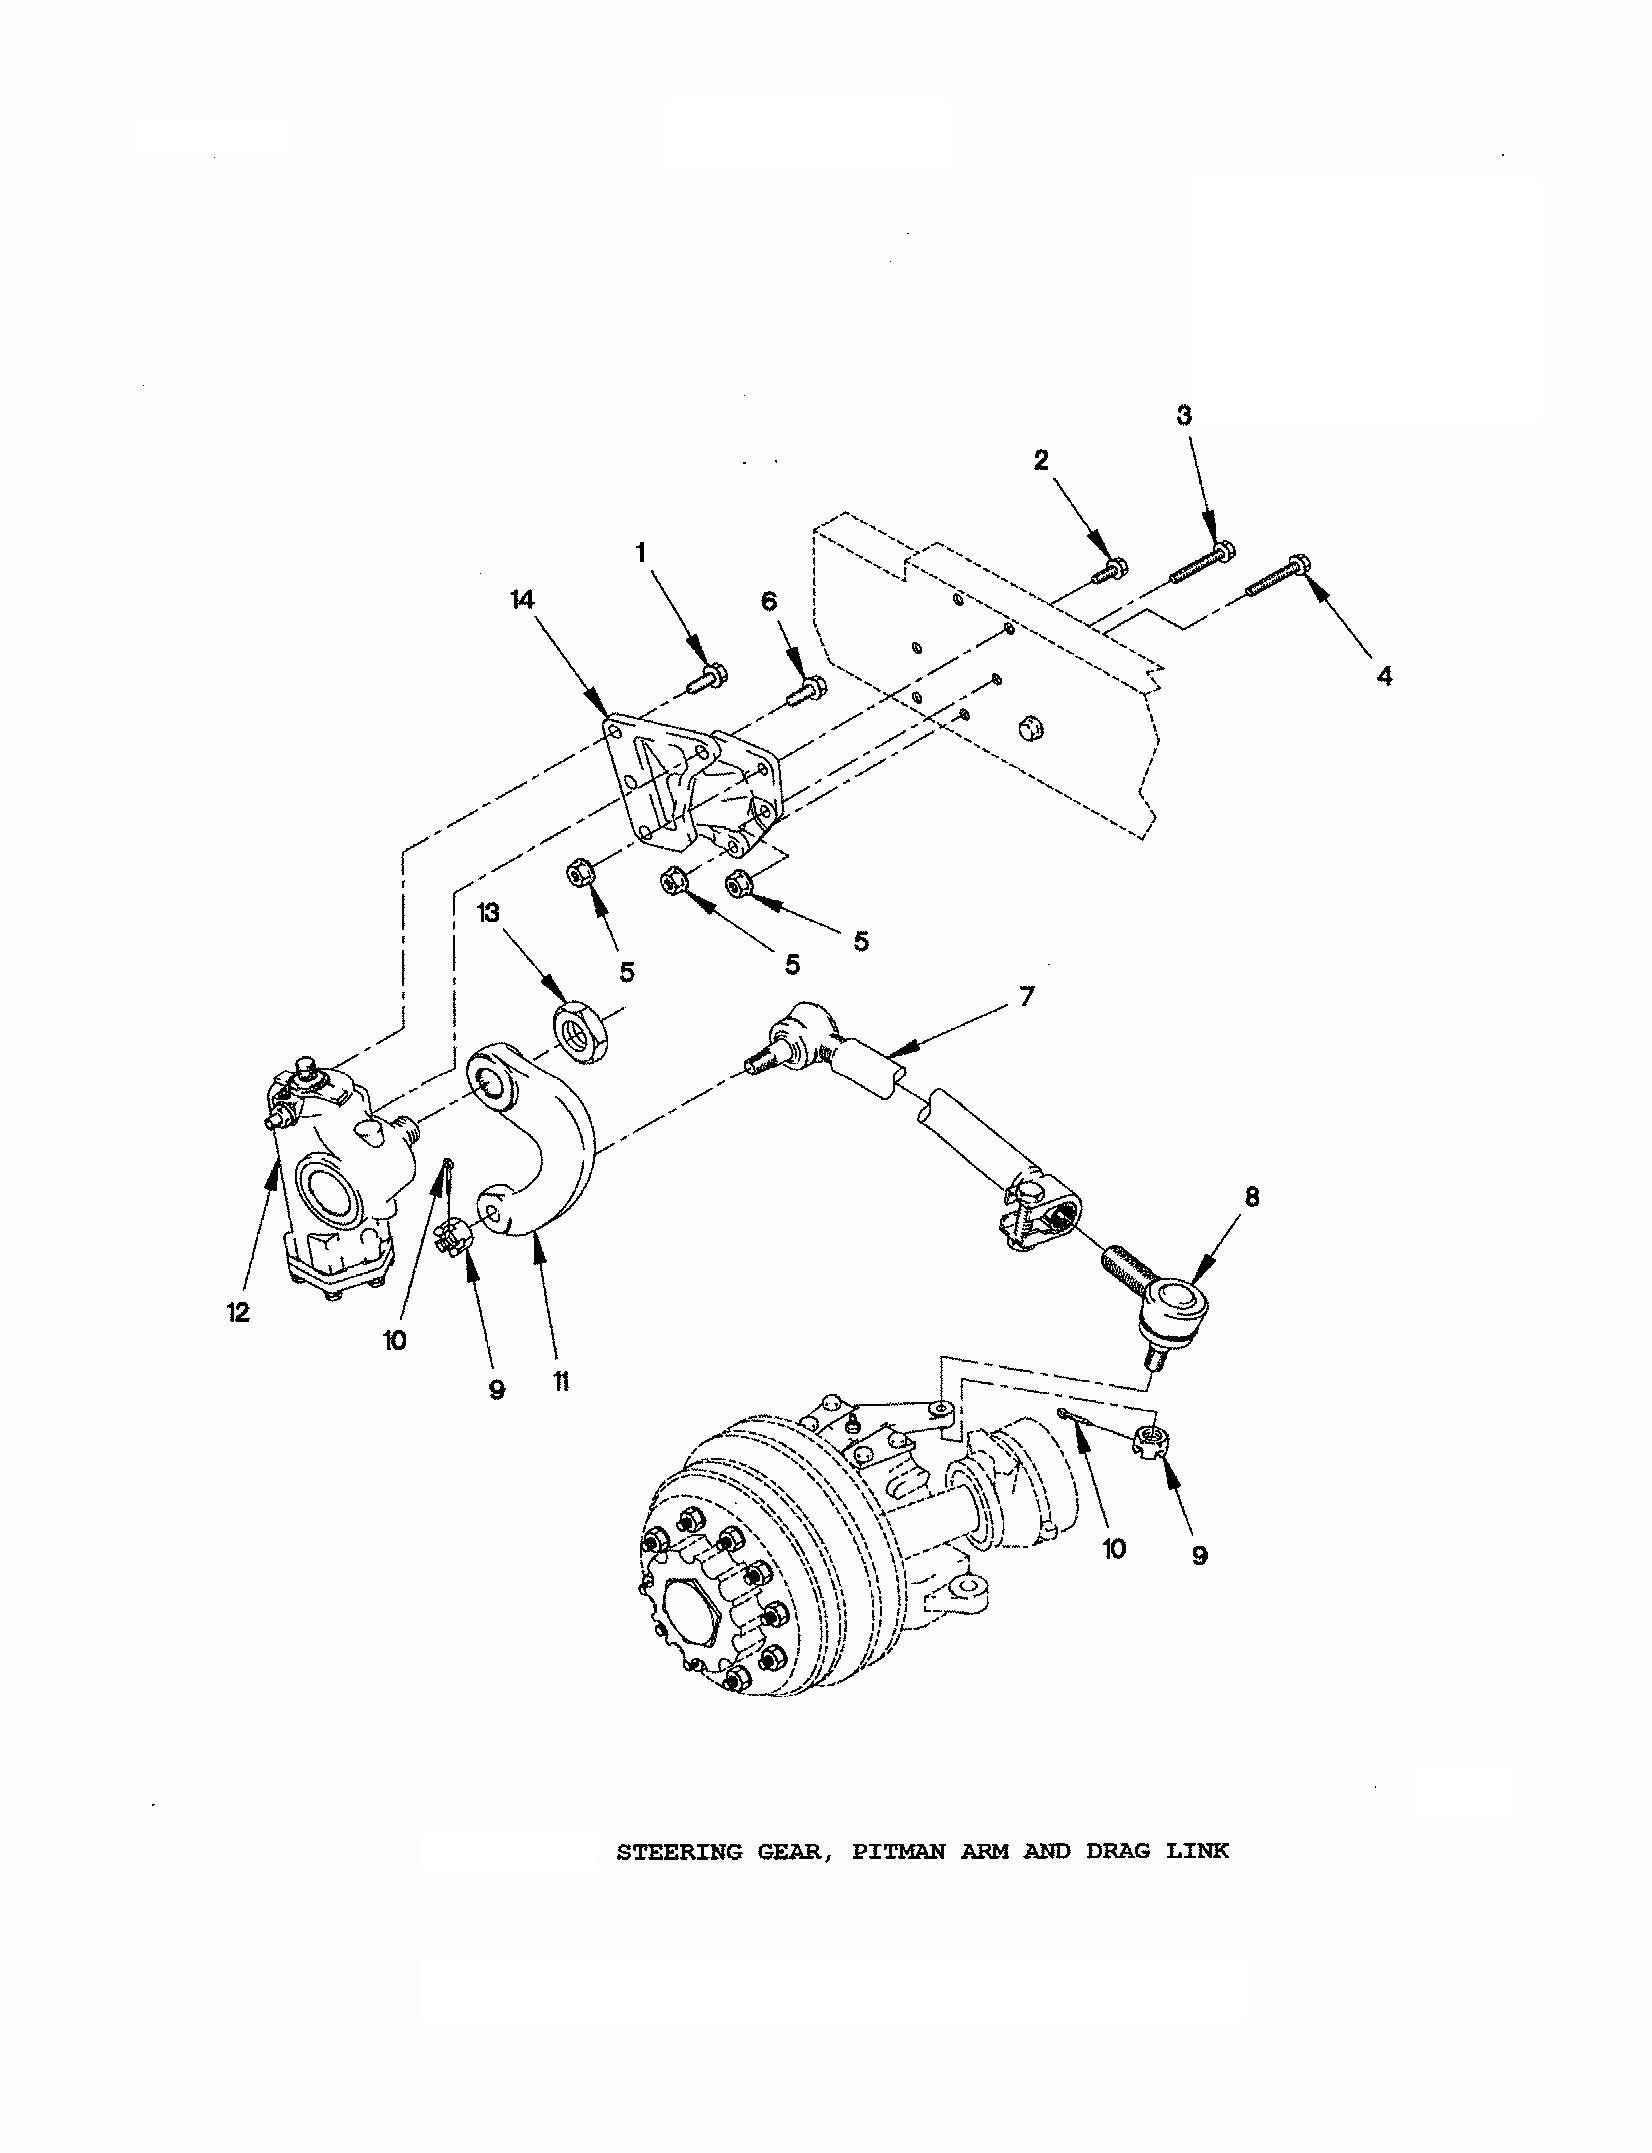 Draglink Steering Arm To Pitman Arm Fmtv Lmtv